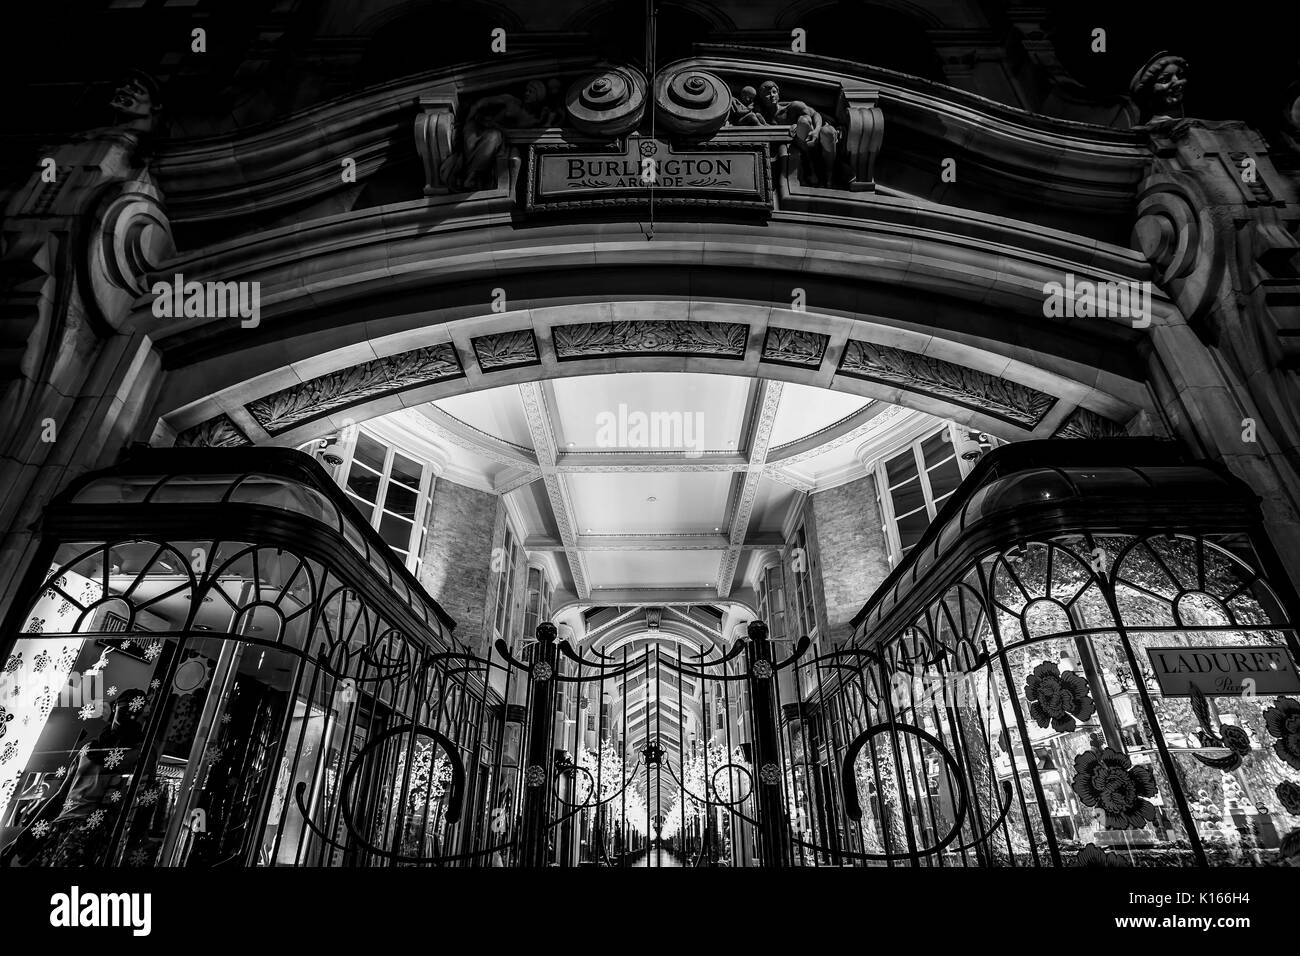 Beautiful Burlington Arcade in London - LONDON / ENGLAND - DECEMBER 6, 2017 - Stock Image